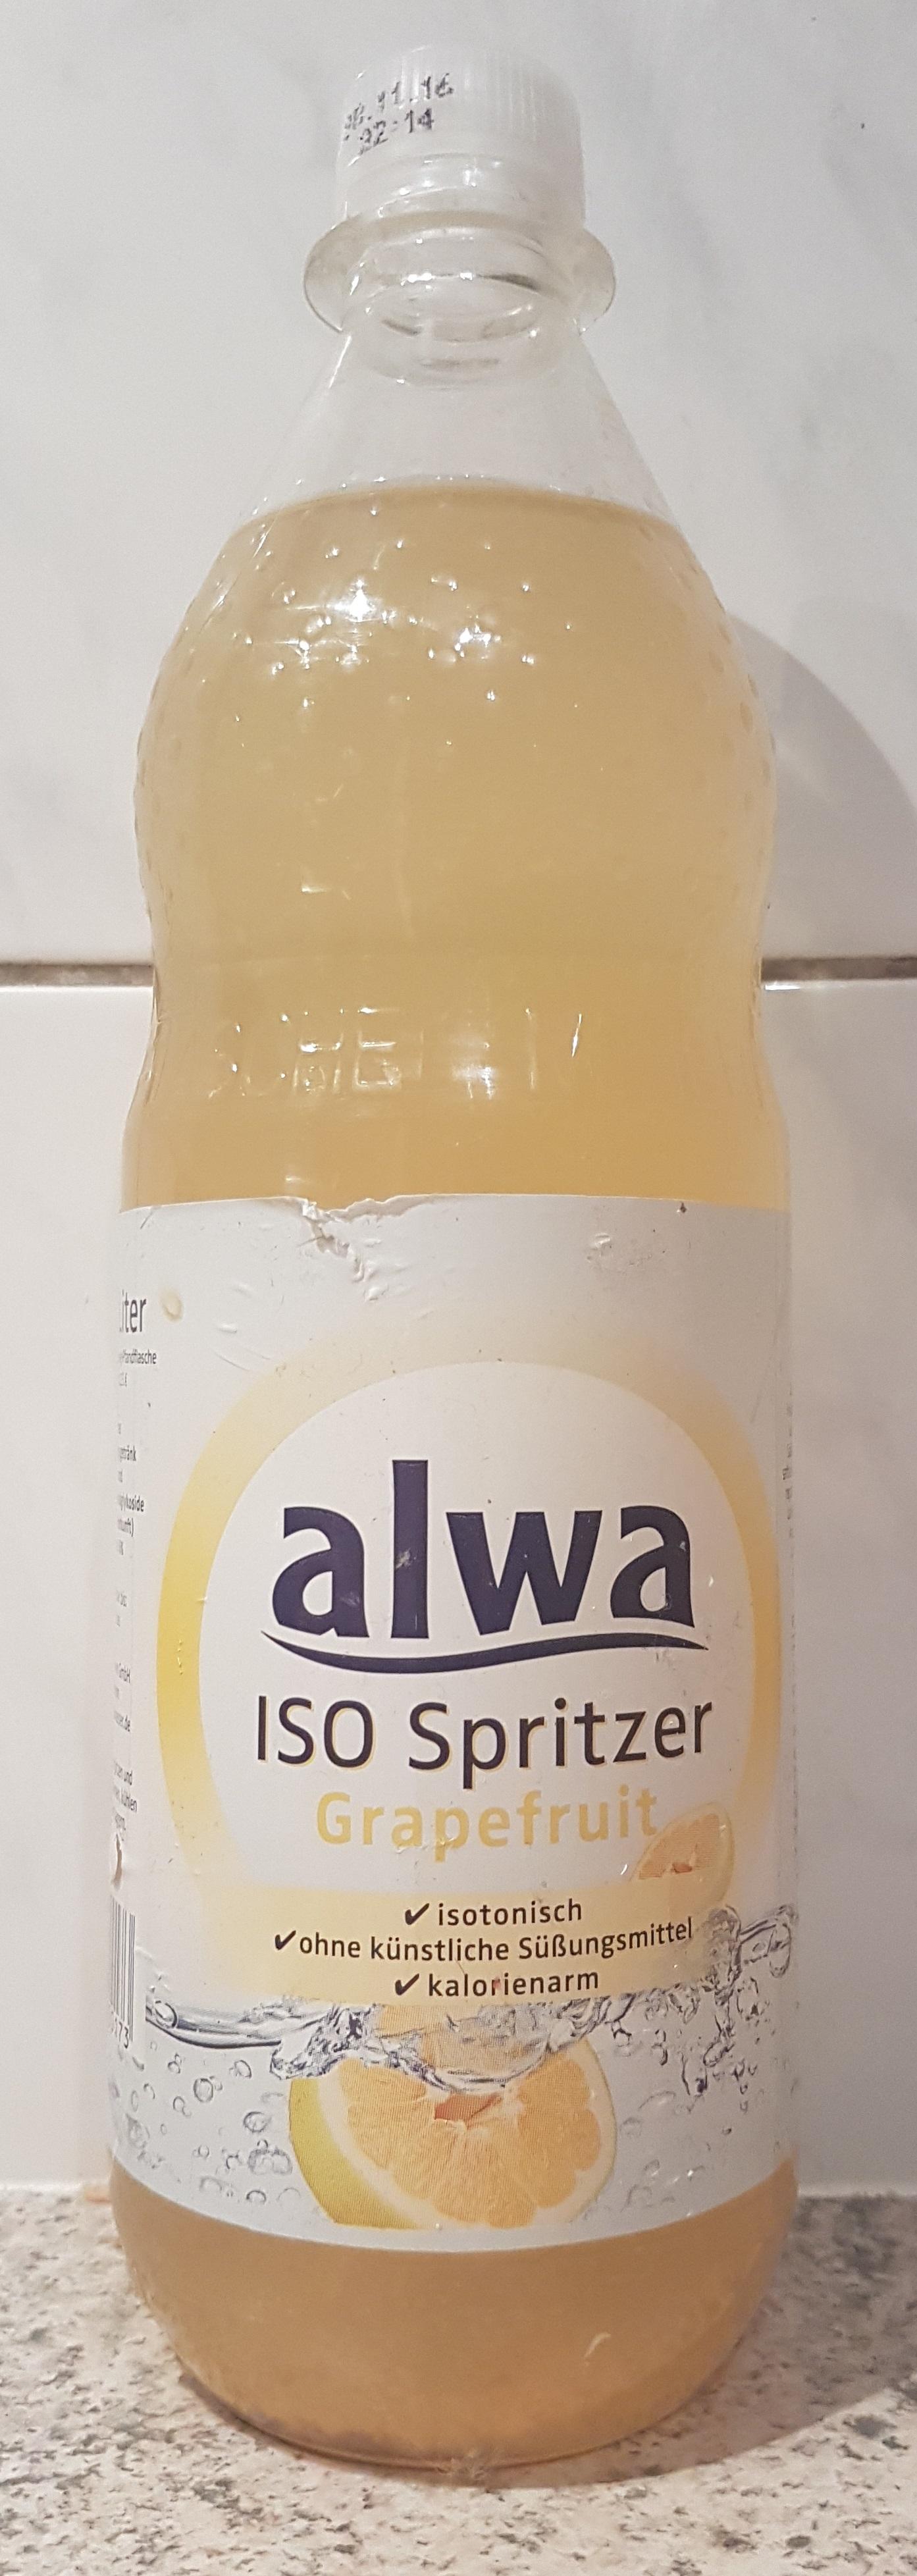 alwa-iso-spritzer-grapefruit